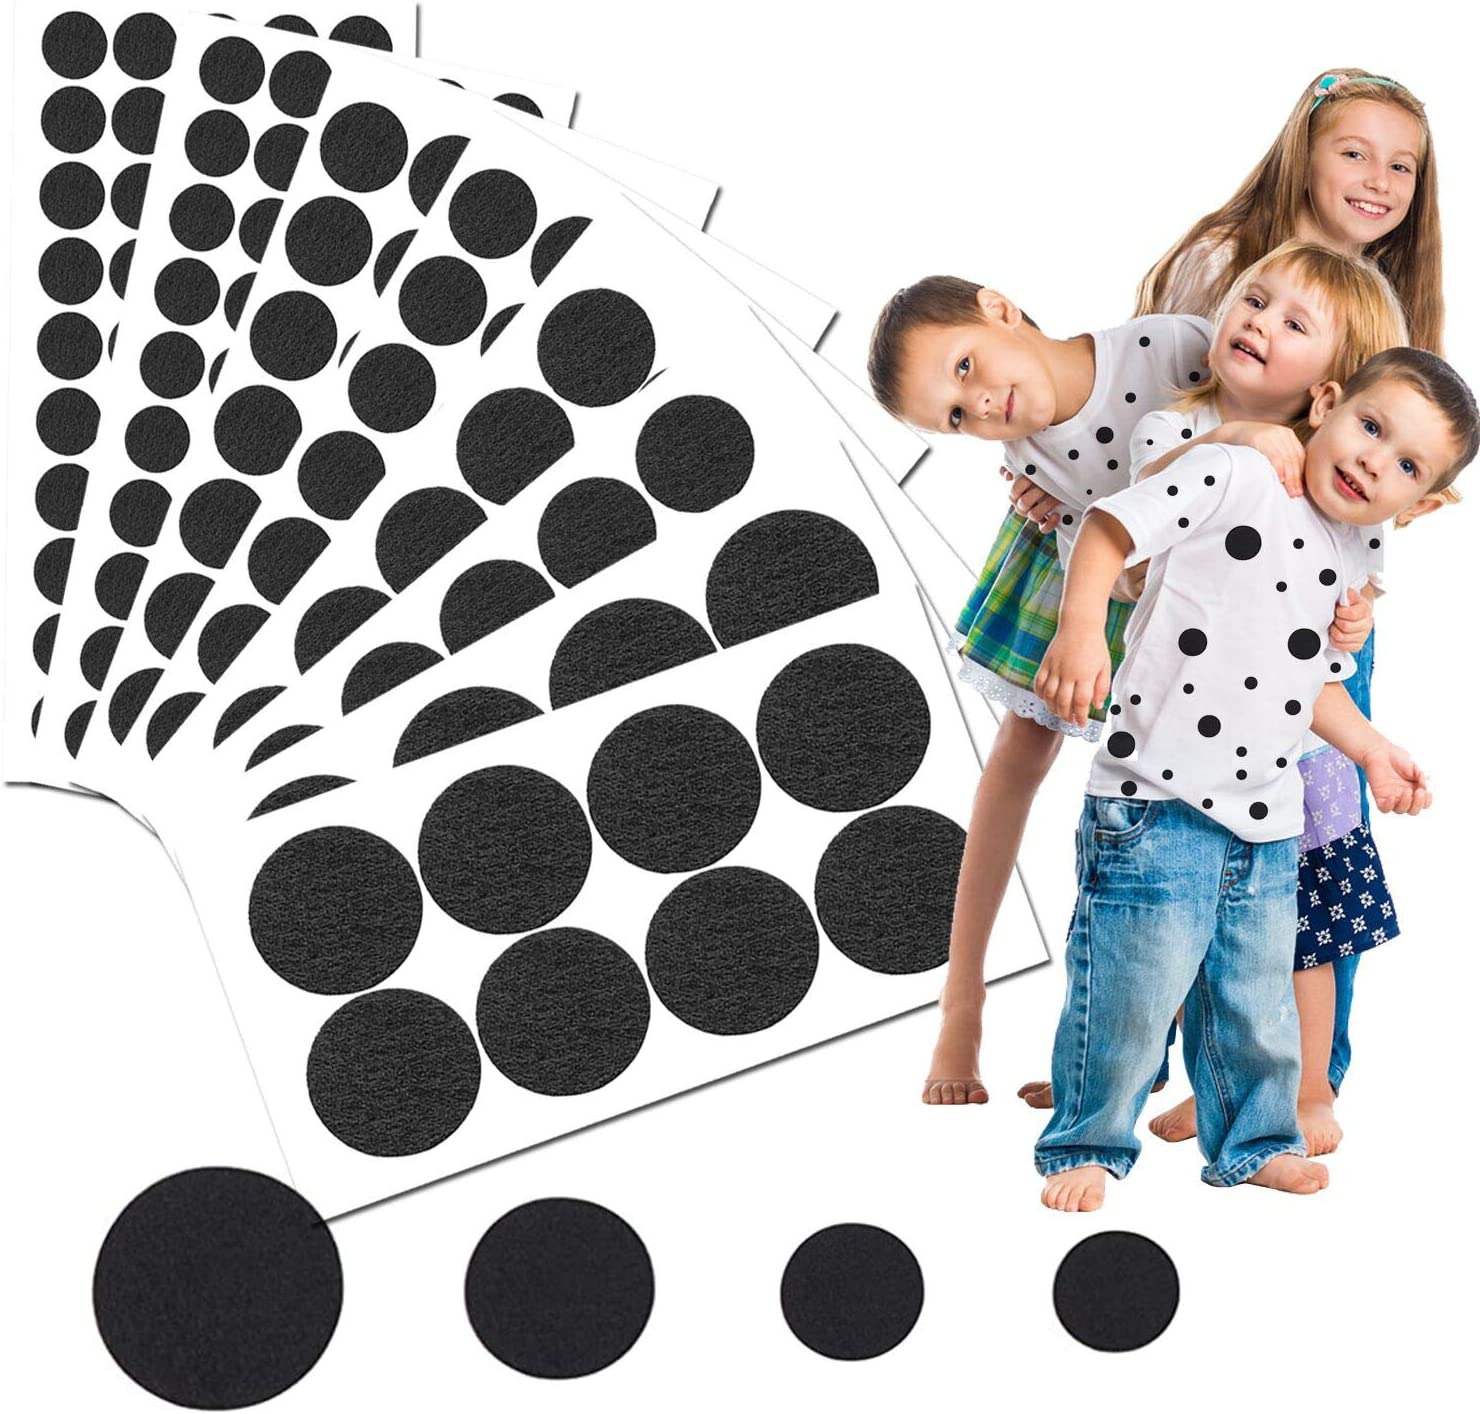 6 Sheets Adhesive Felt Pads Spotty Dog Style Felt Irregular Shape DIY Felt for Halloween DIY Projects Costume Black